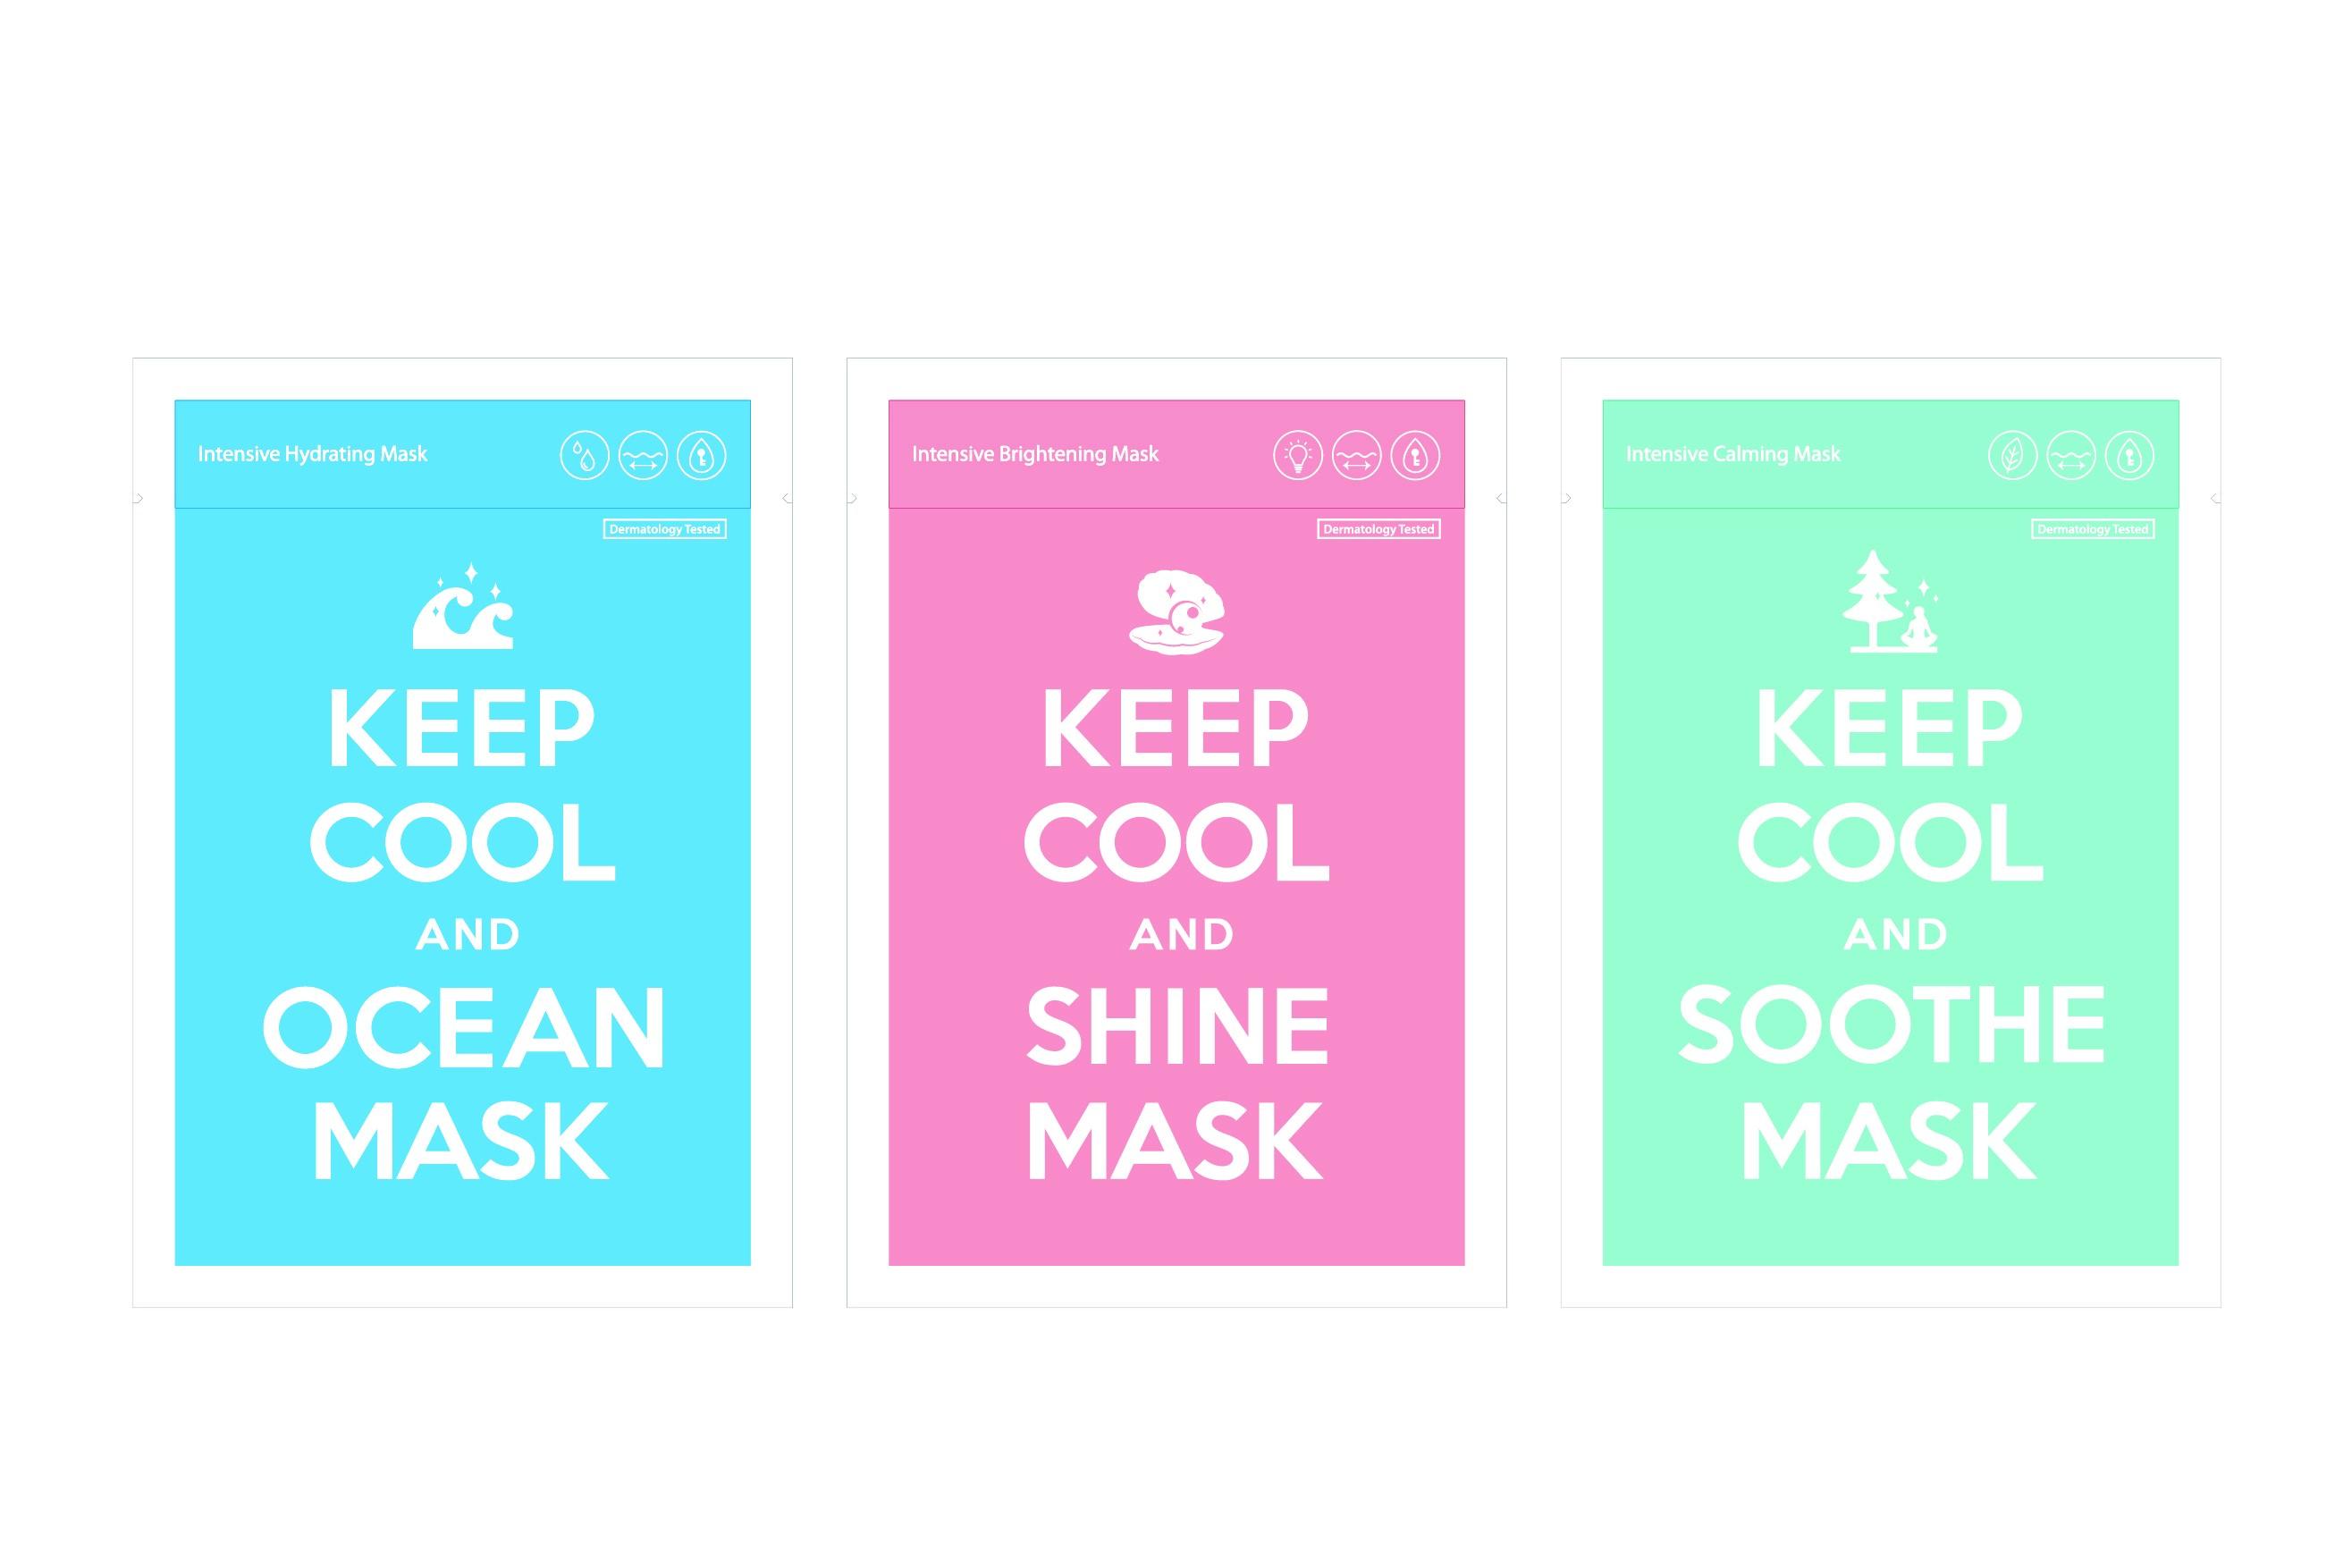 mascarilla, piel, hidratacion, sheet mask